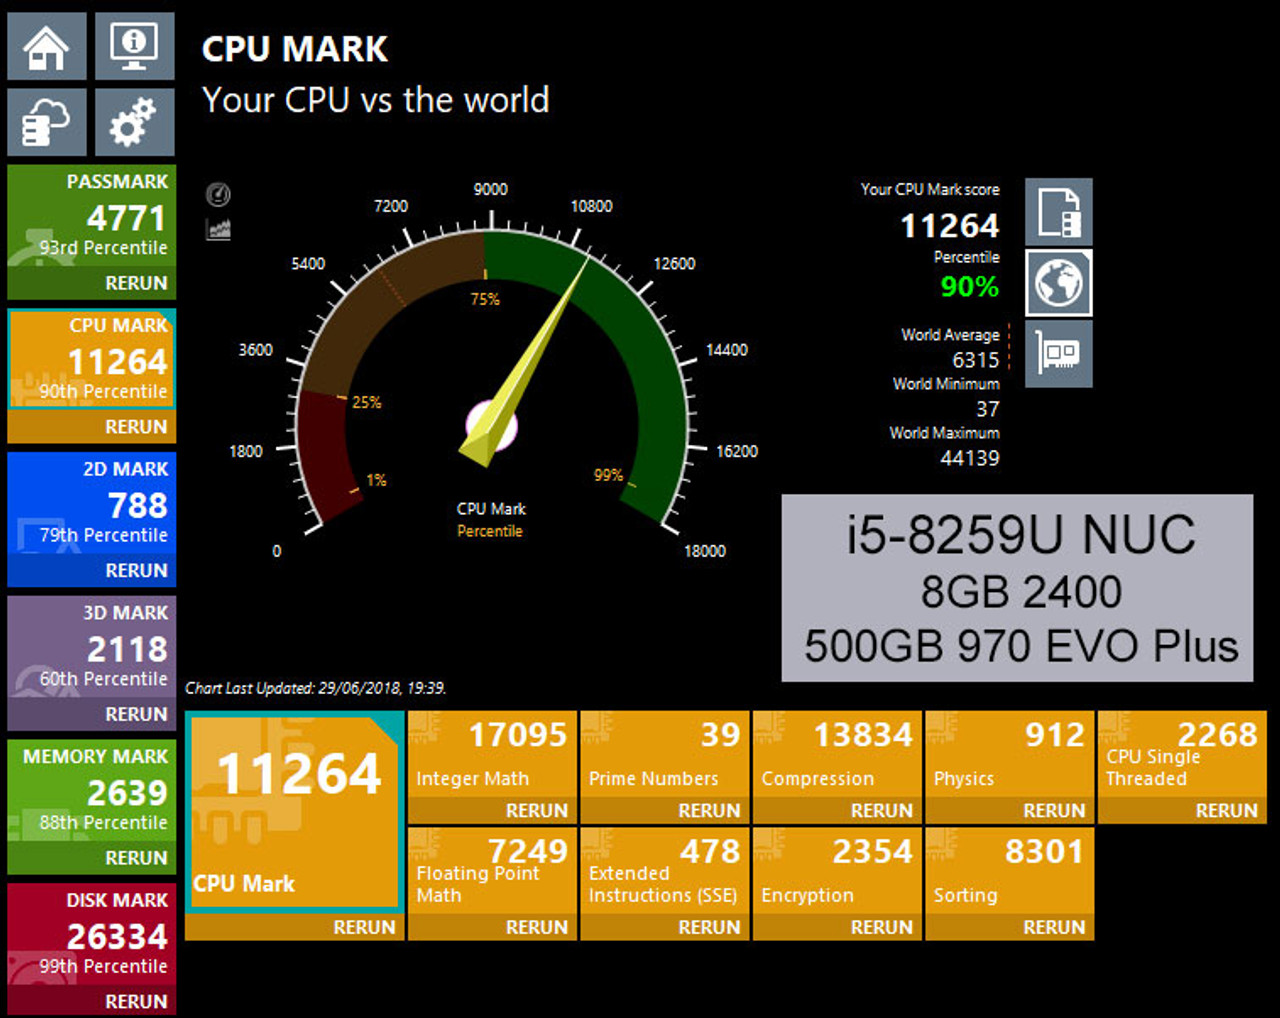 Fanless 8th Gen NUC Core i5 PC, 8GB DDR4, 250GB Samsung 970 EVO Plus SSD,  Thunderbolt 3 [Turing-i5]